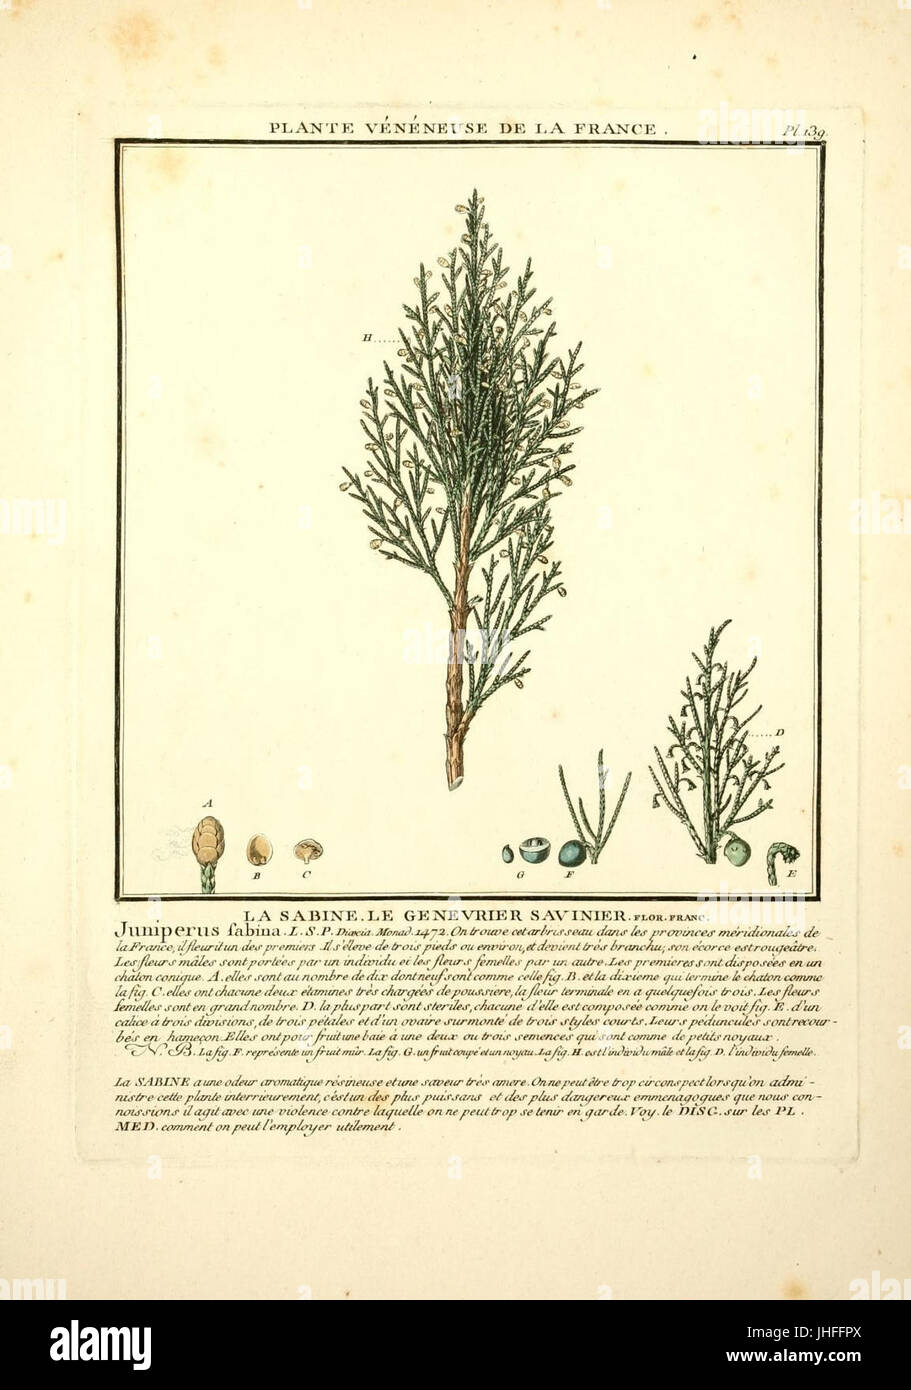 Herbier De La France 10038564186 Stock Photo 148473778 Alamy